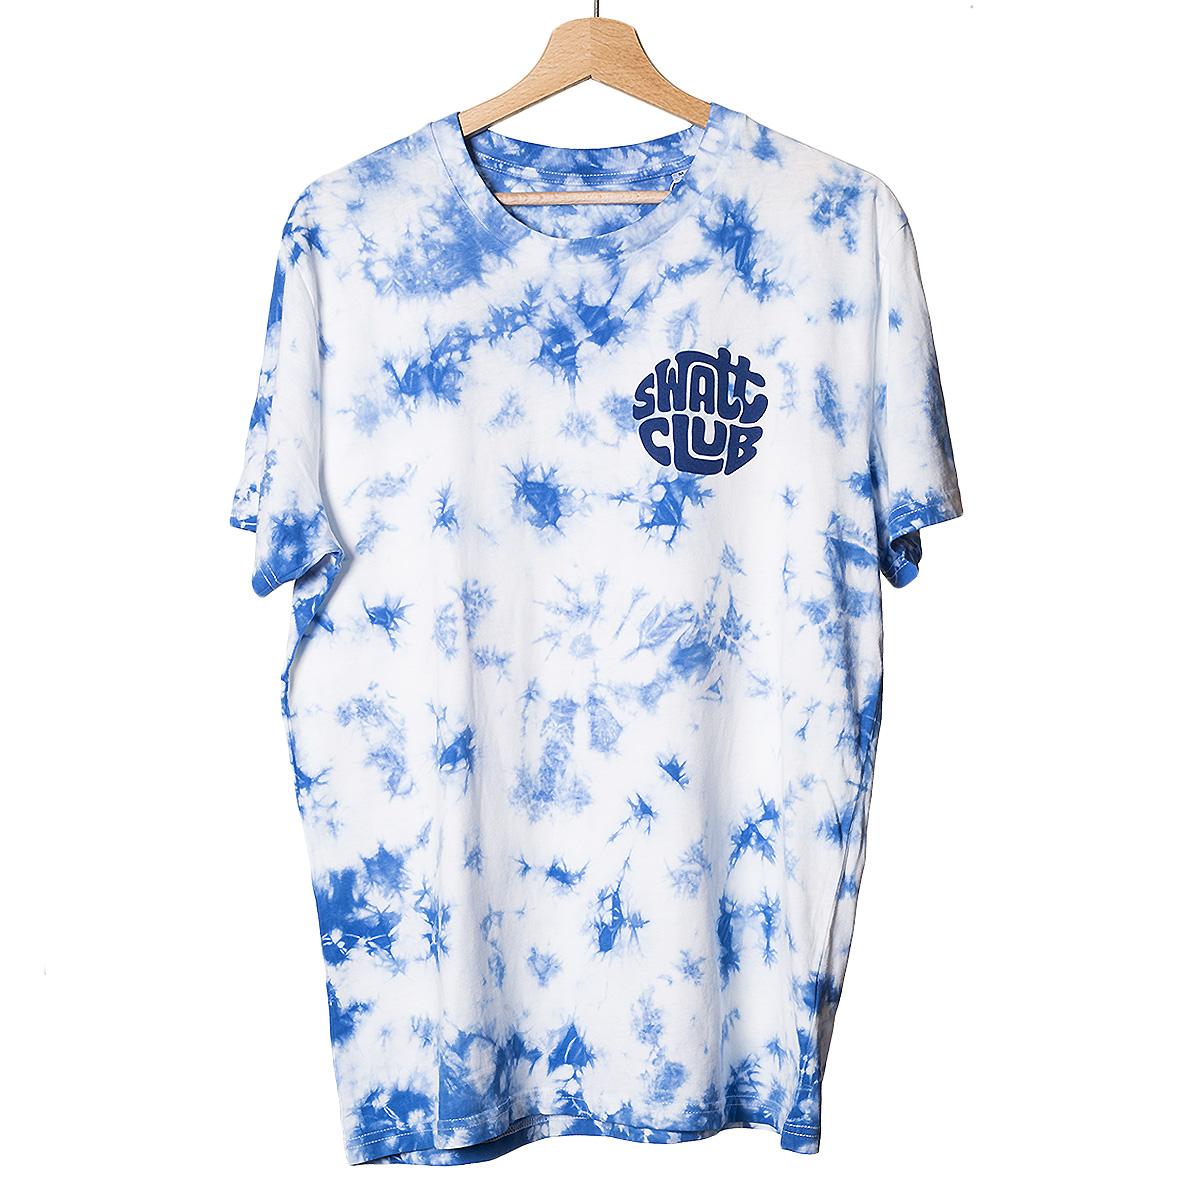 tie and dye swatt club solowattaggio t-shirt